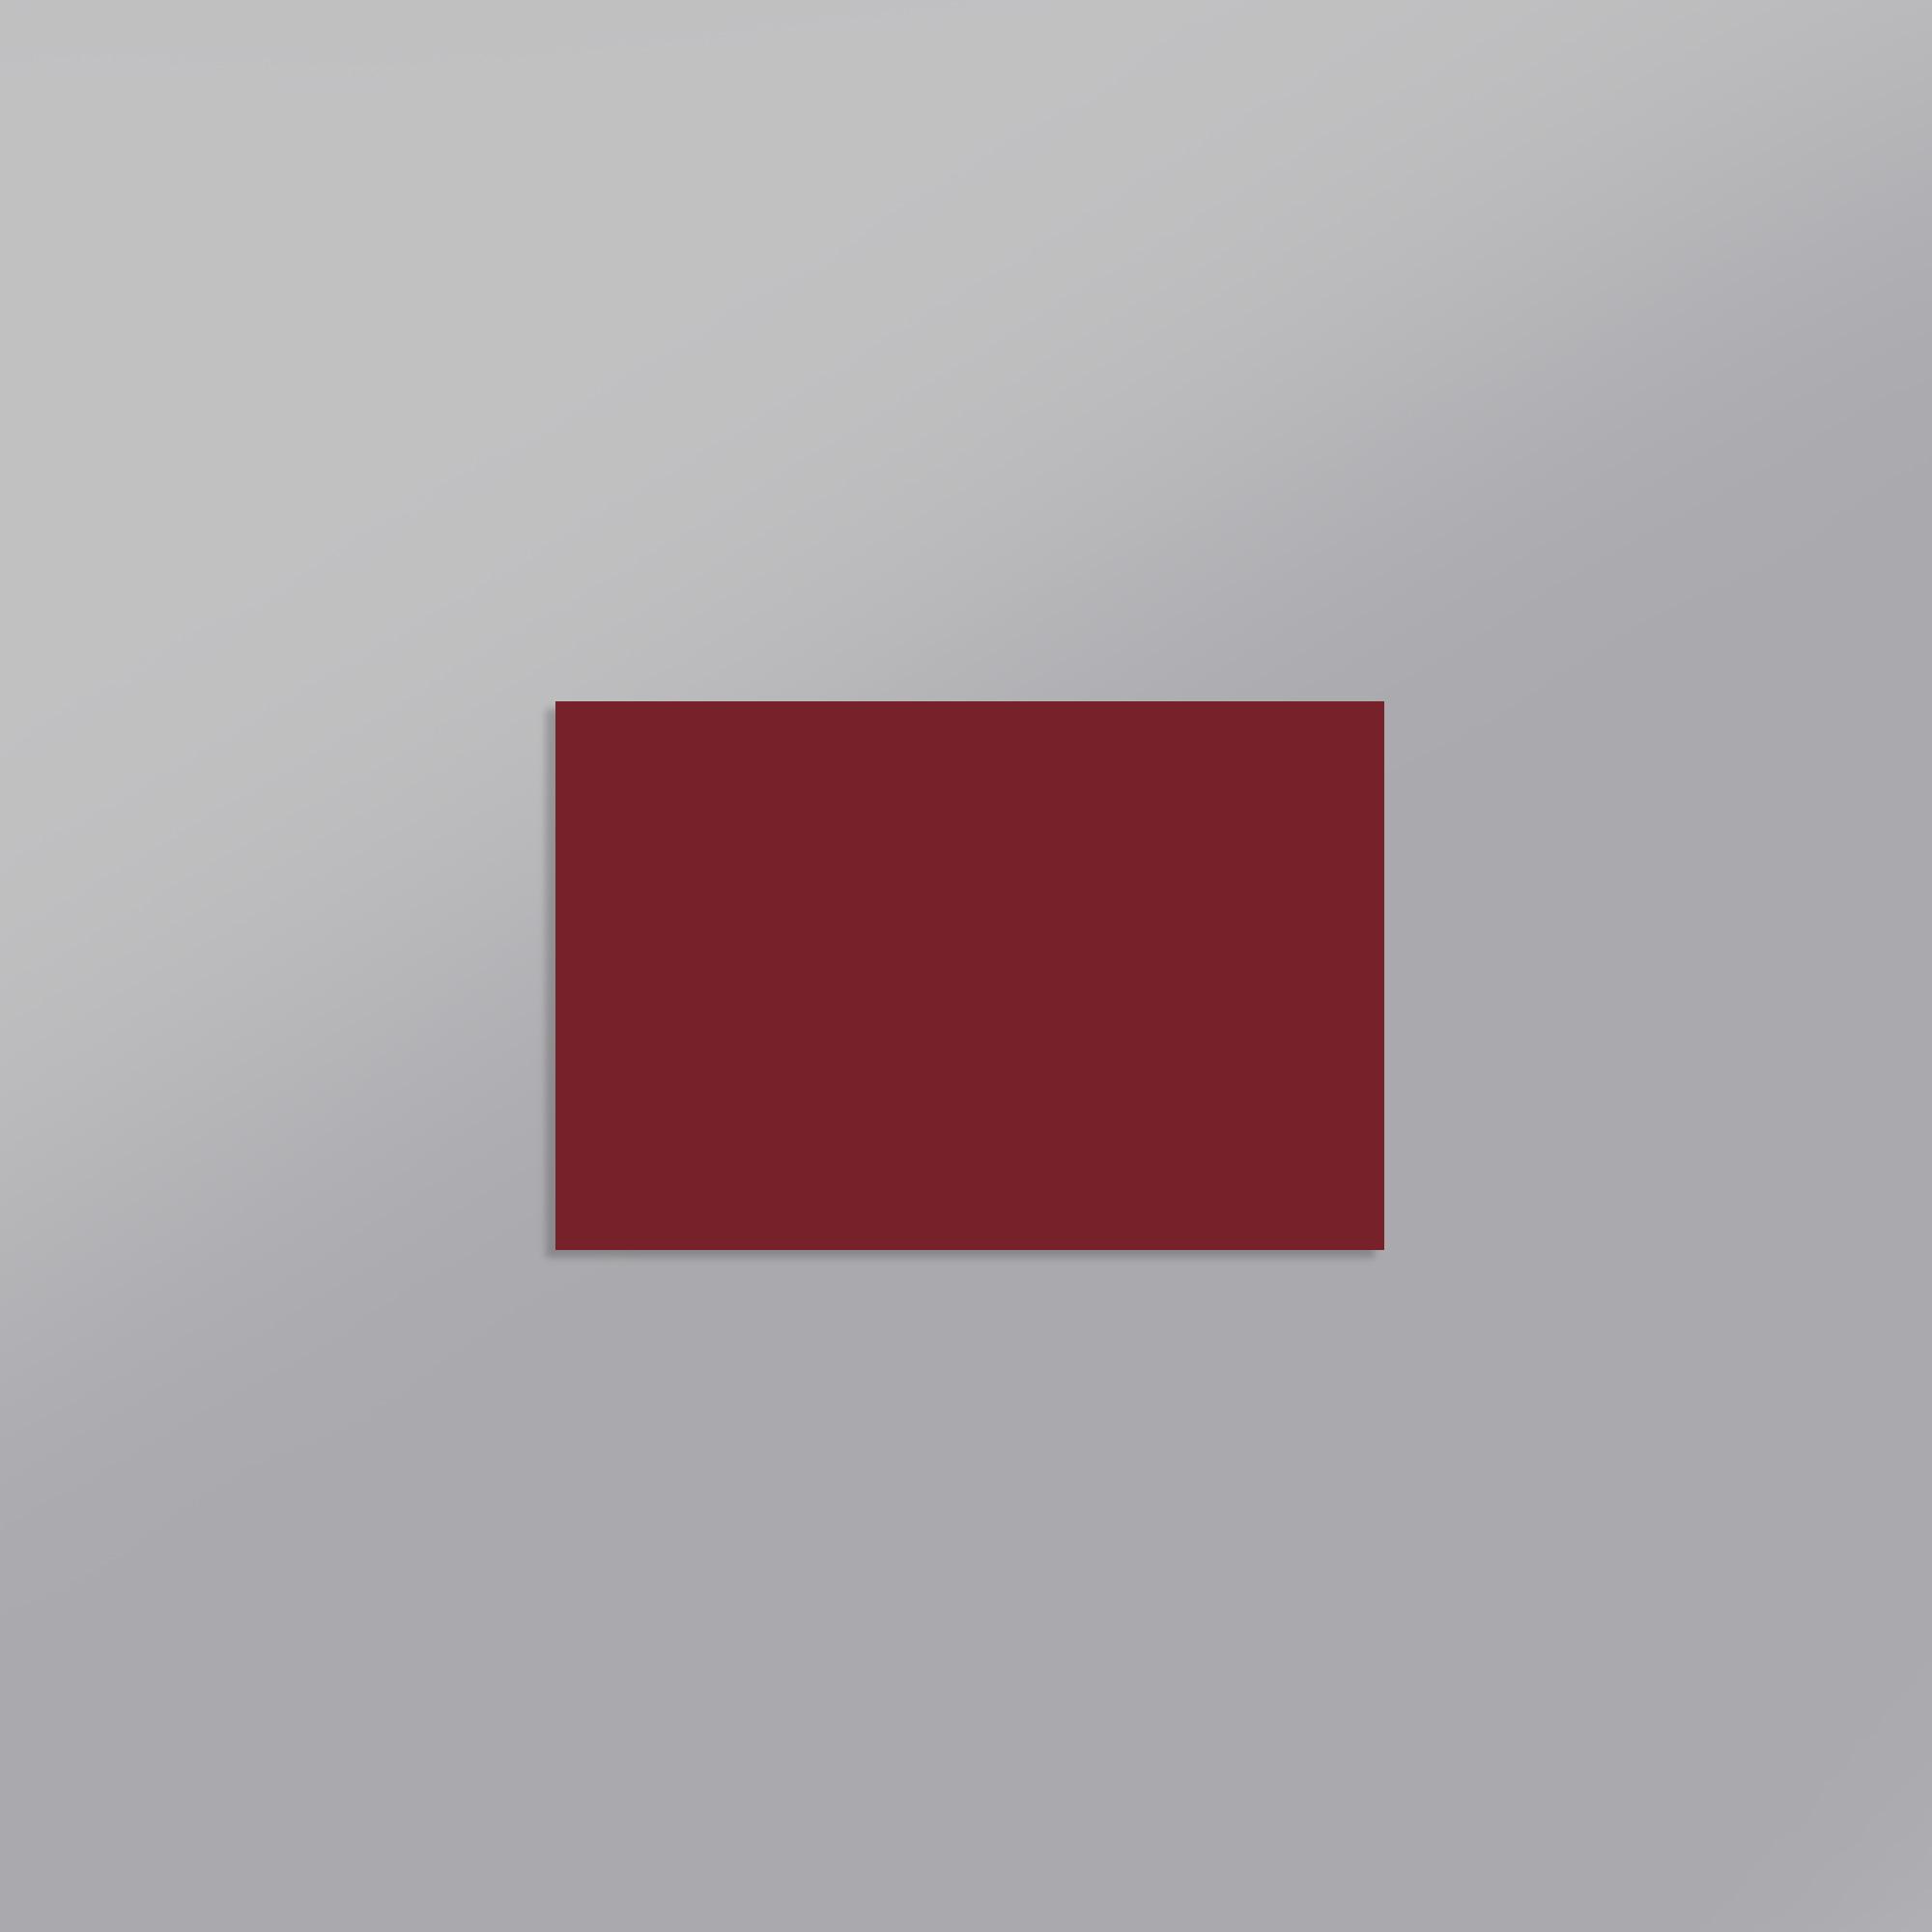 mdf italia randomissimo r ckwand f r modul b f101482f026 reuter onlineshop. Black Bedroom Furniture Sets. Home Design Ideas